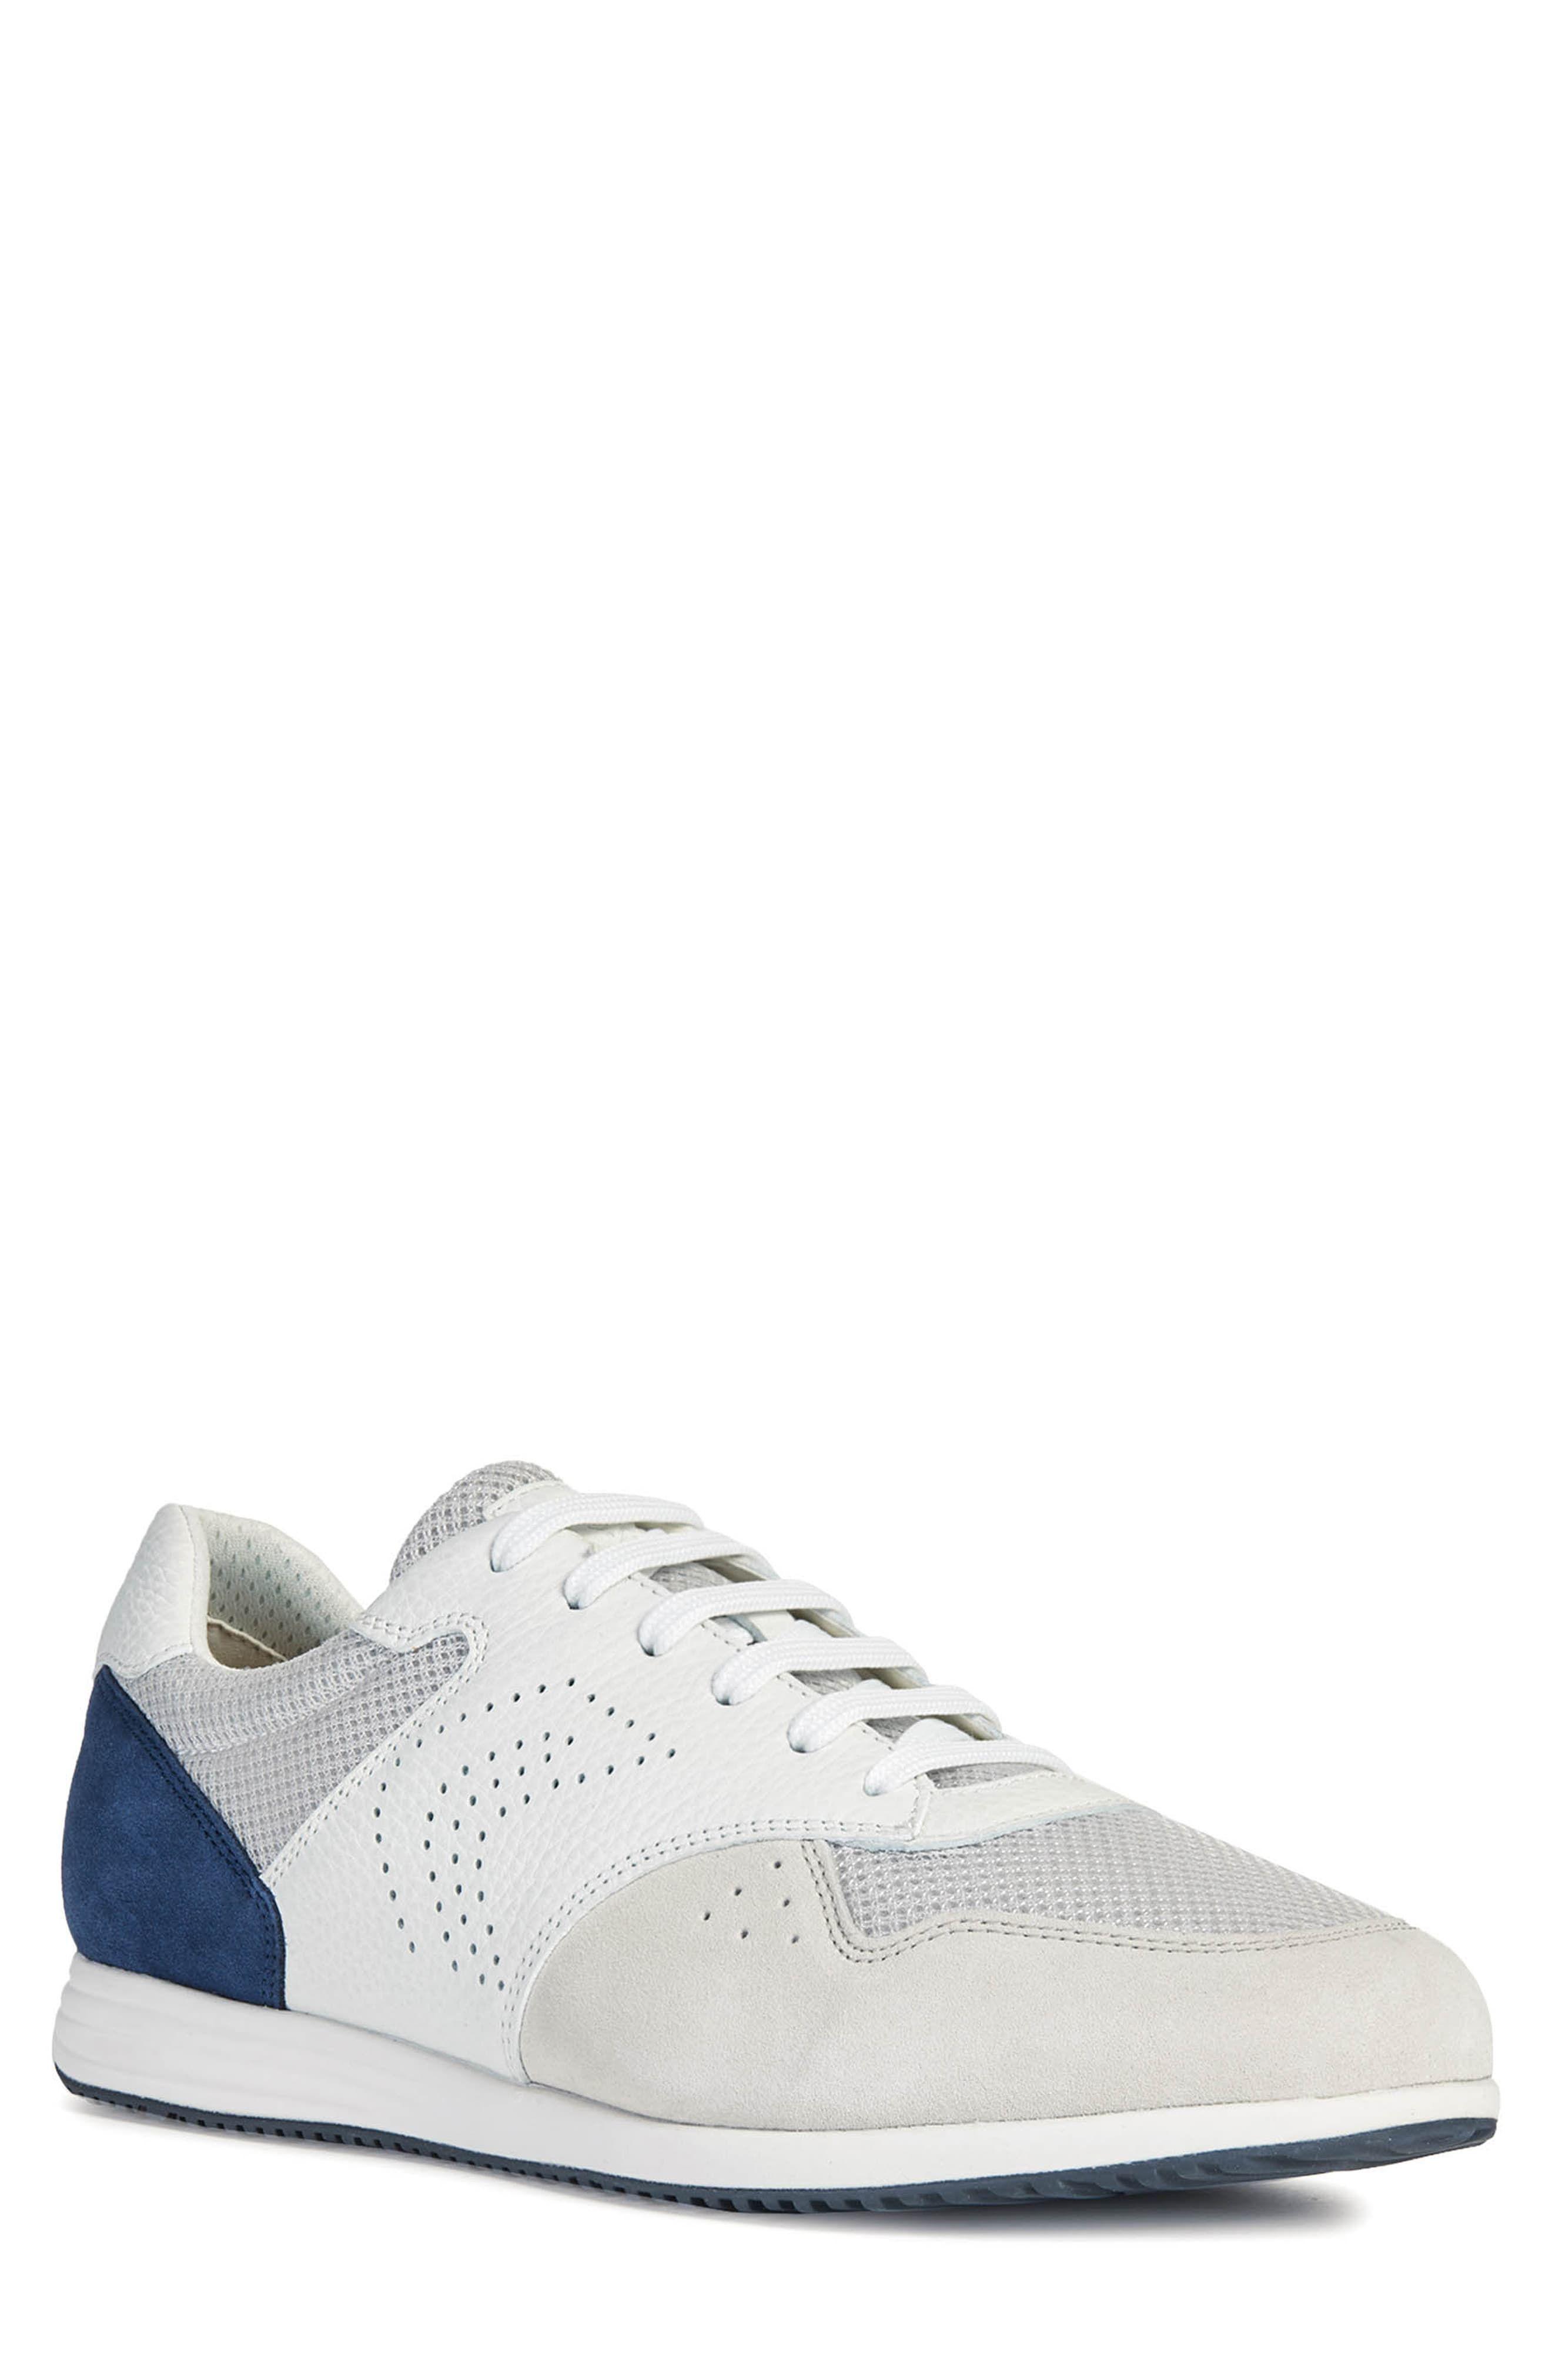 Geox Arsien 2 Sneaker | Products in 2019 | Sneakers, Men